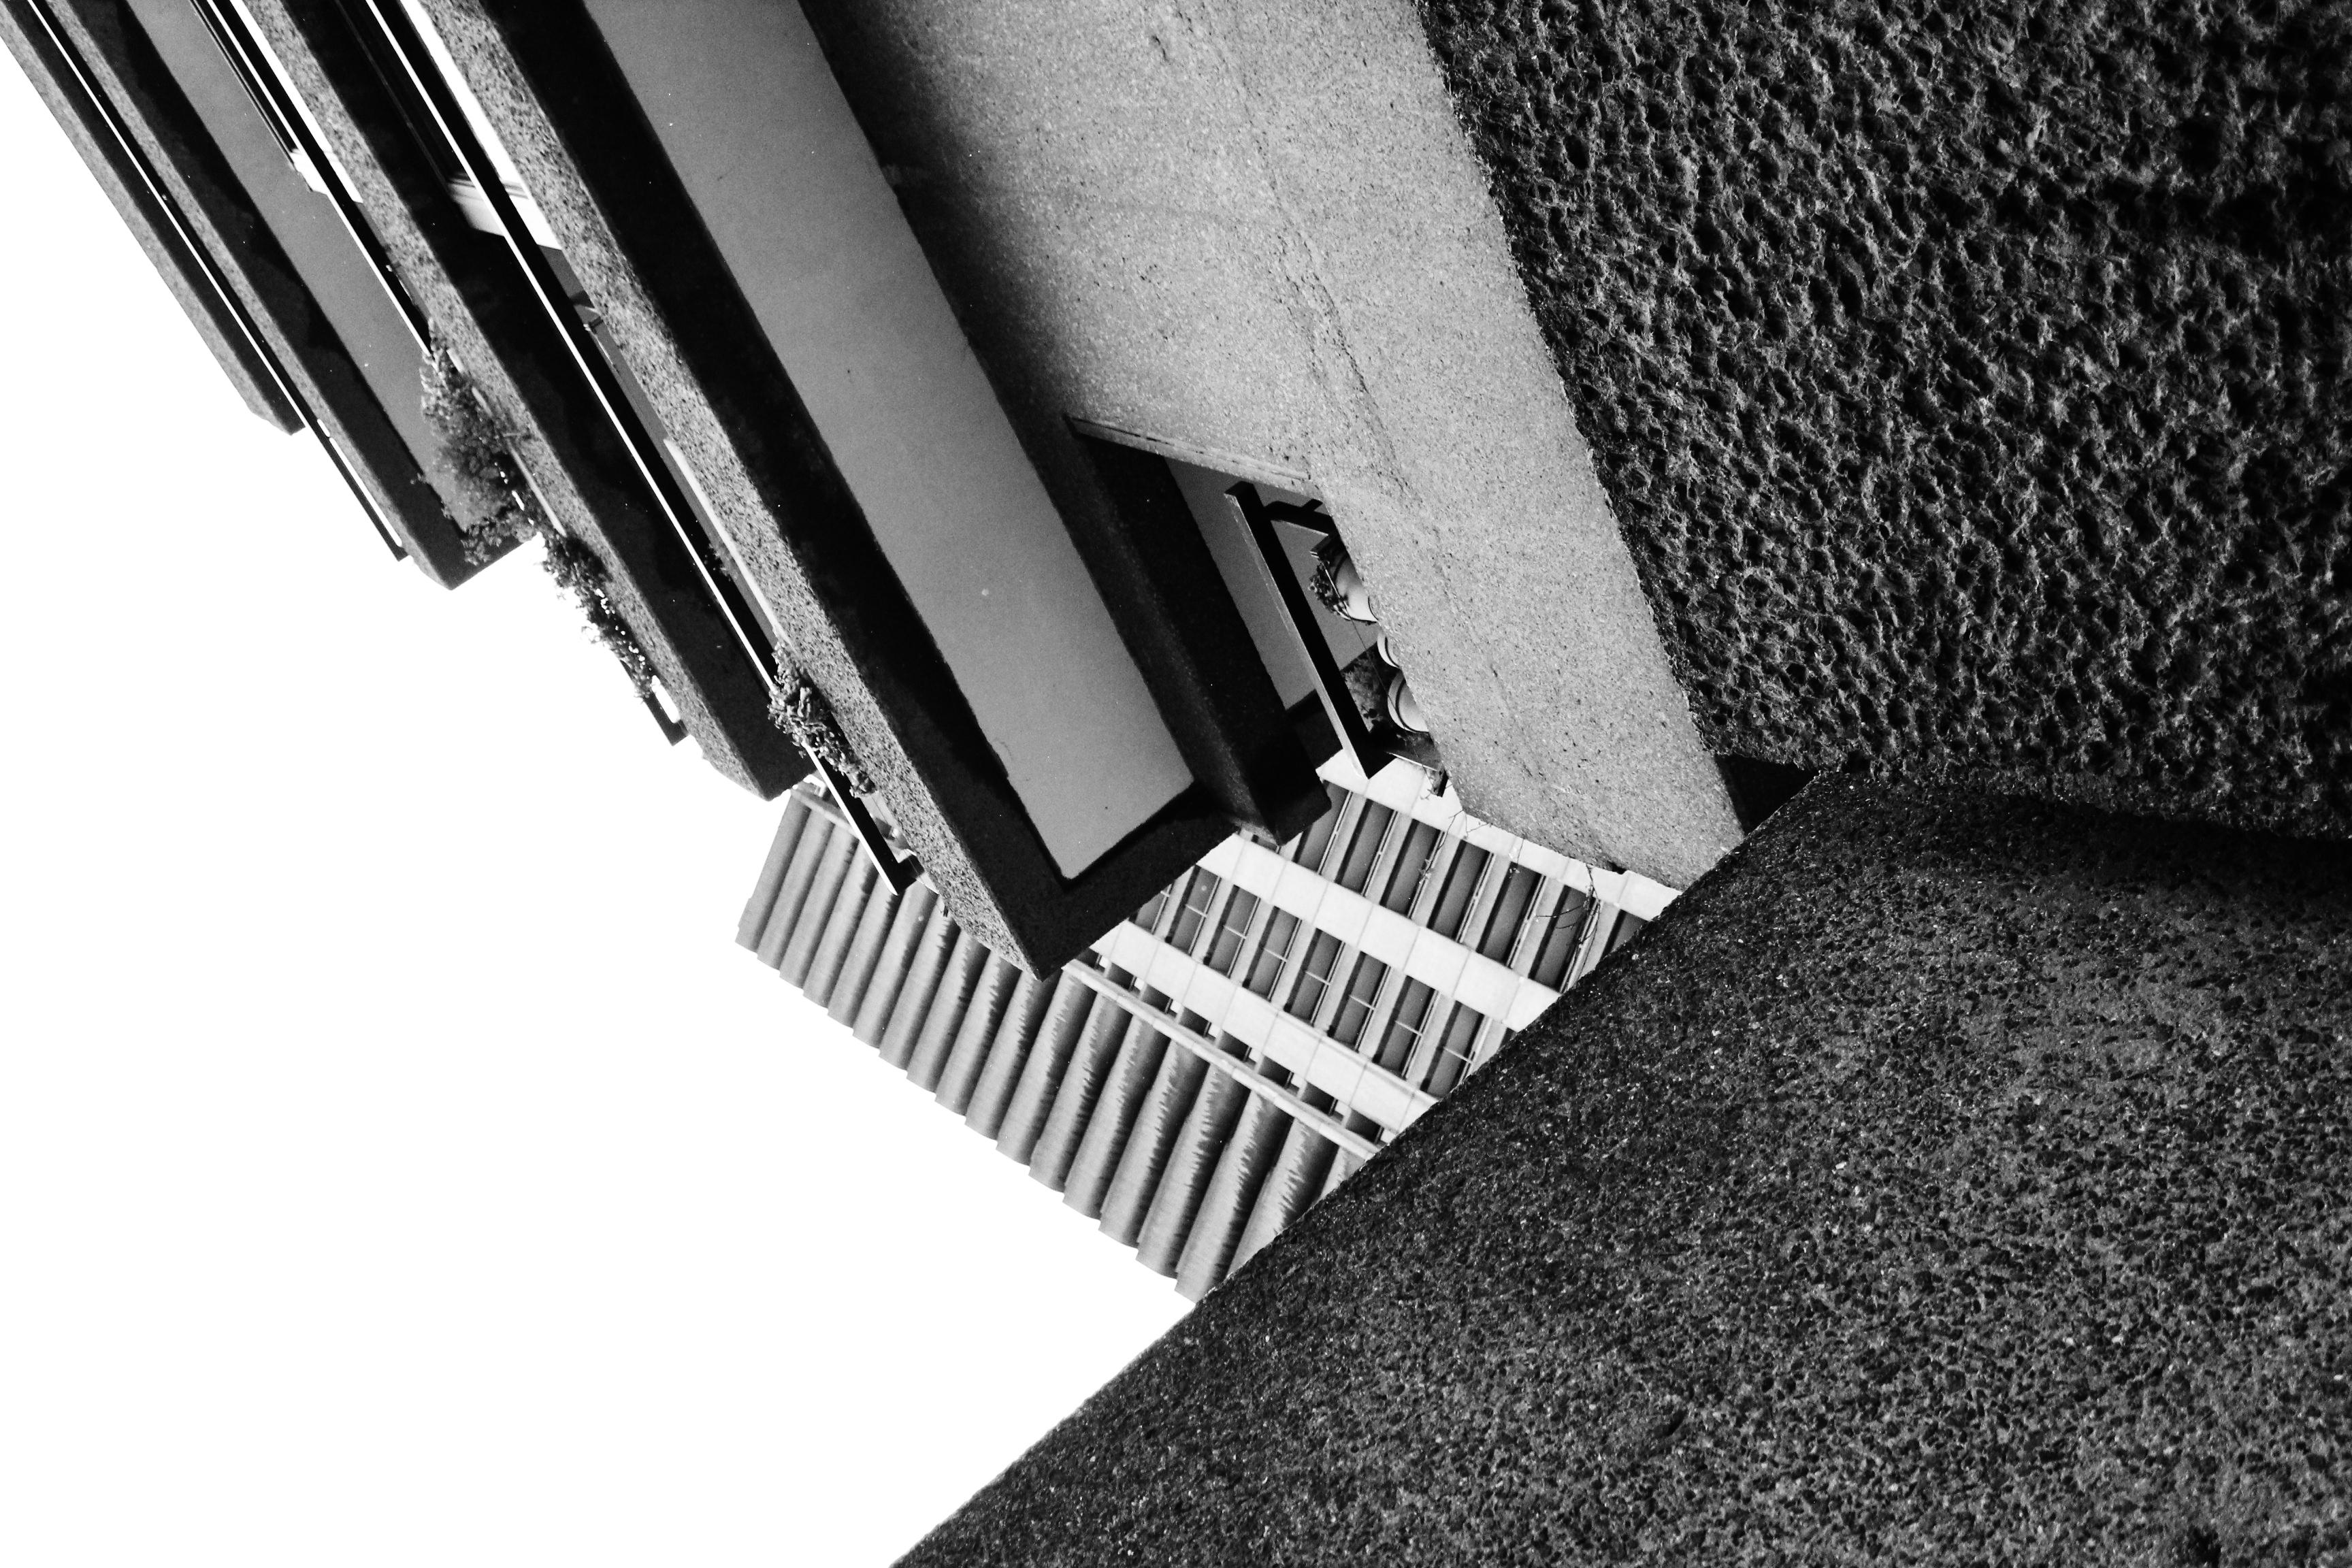 The Barbican, London - Photo Essay by Amit Khanna (14).jpg